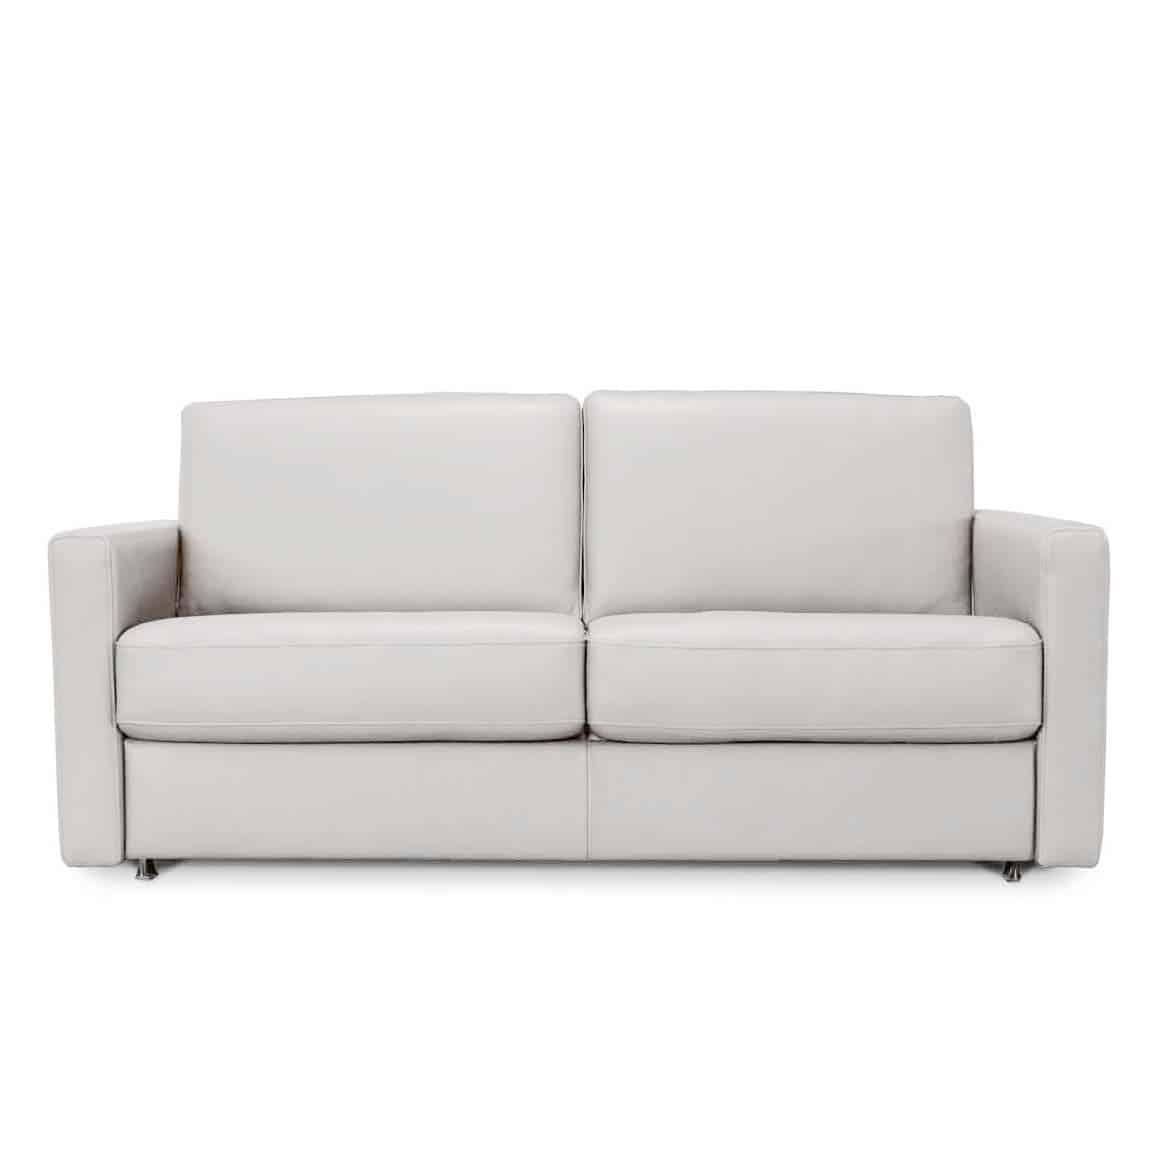 schlafsofa-comfort-kiesel